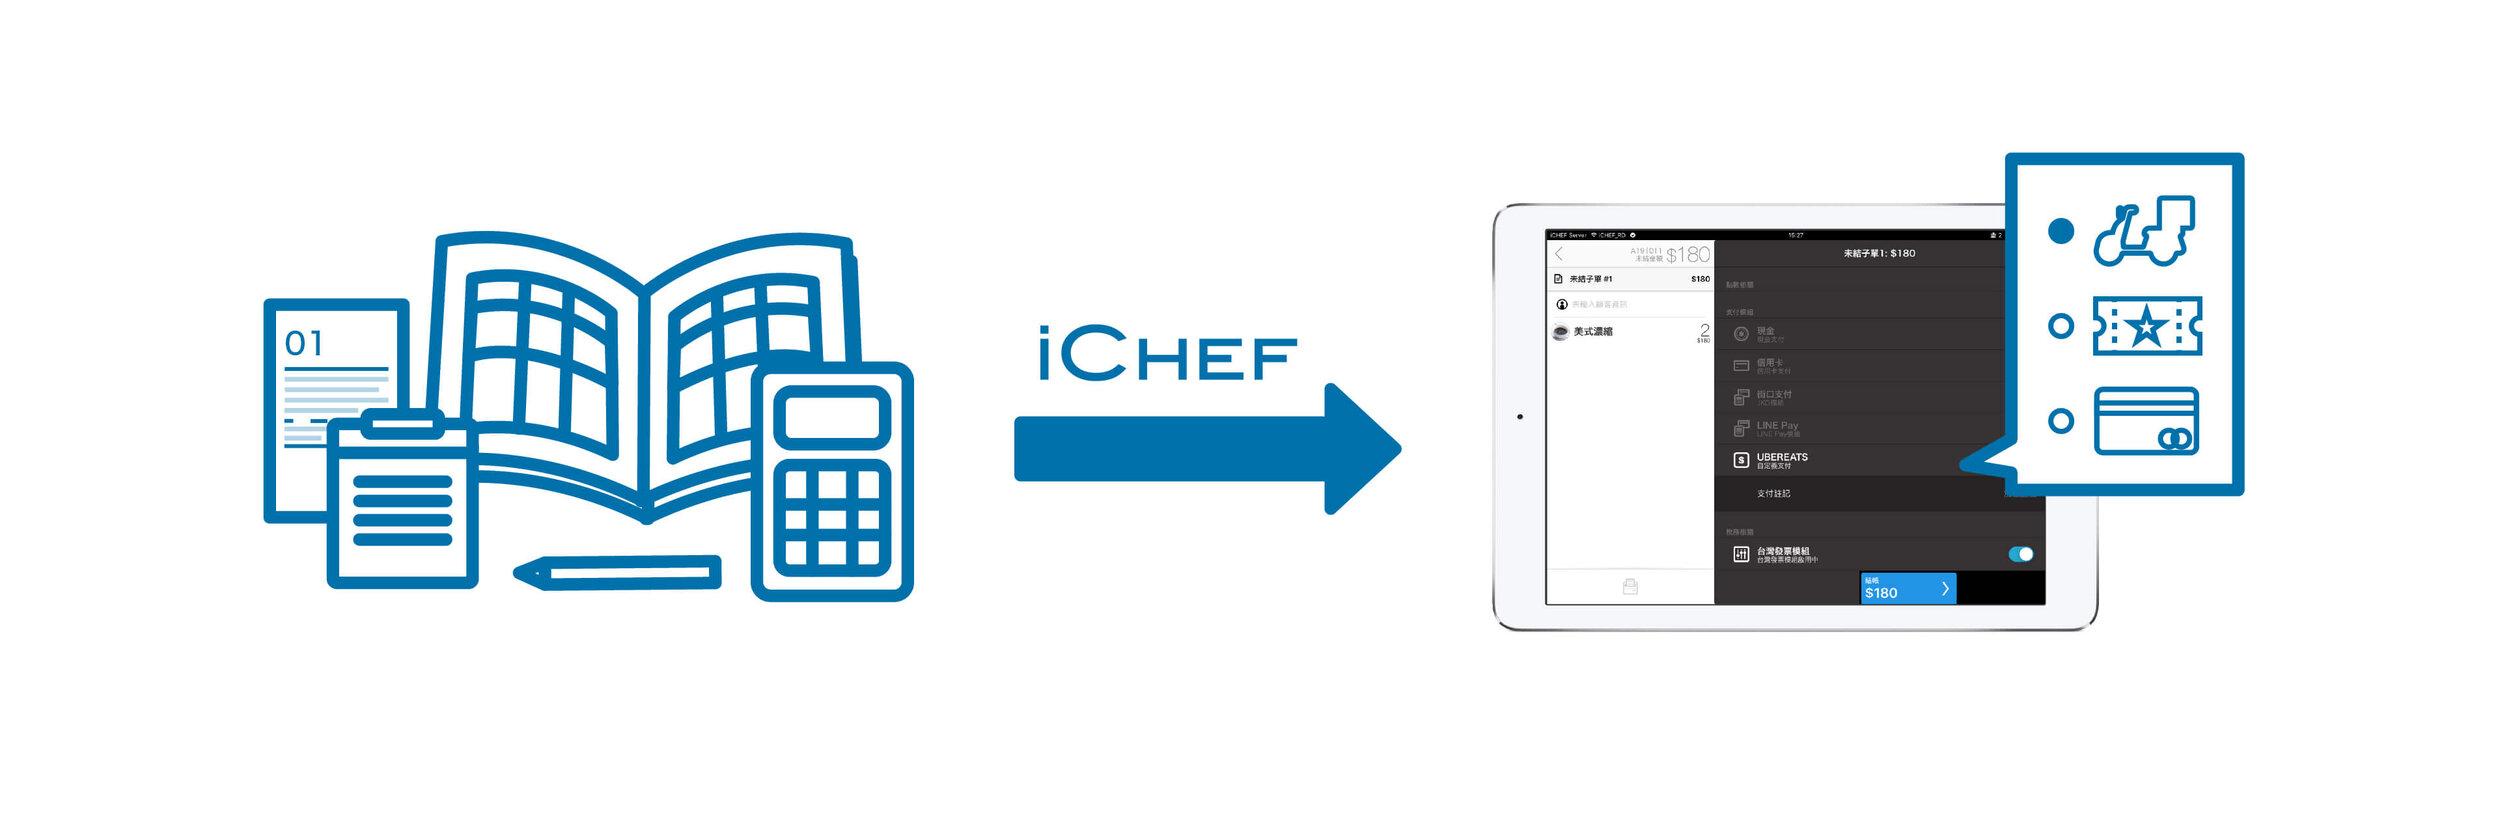 iCHEF 支付整合 不只刷卡機。LINE Pay、街口也完美整合 iCHEF iPad POS 點餐系統